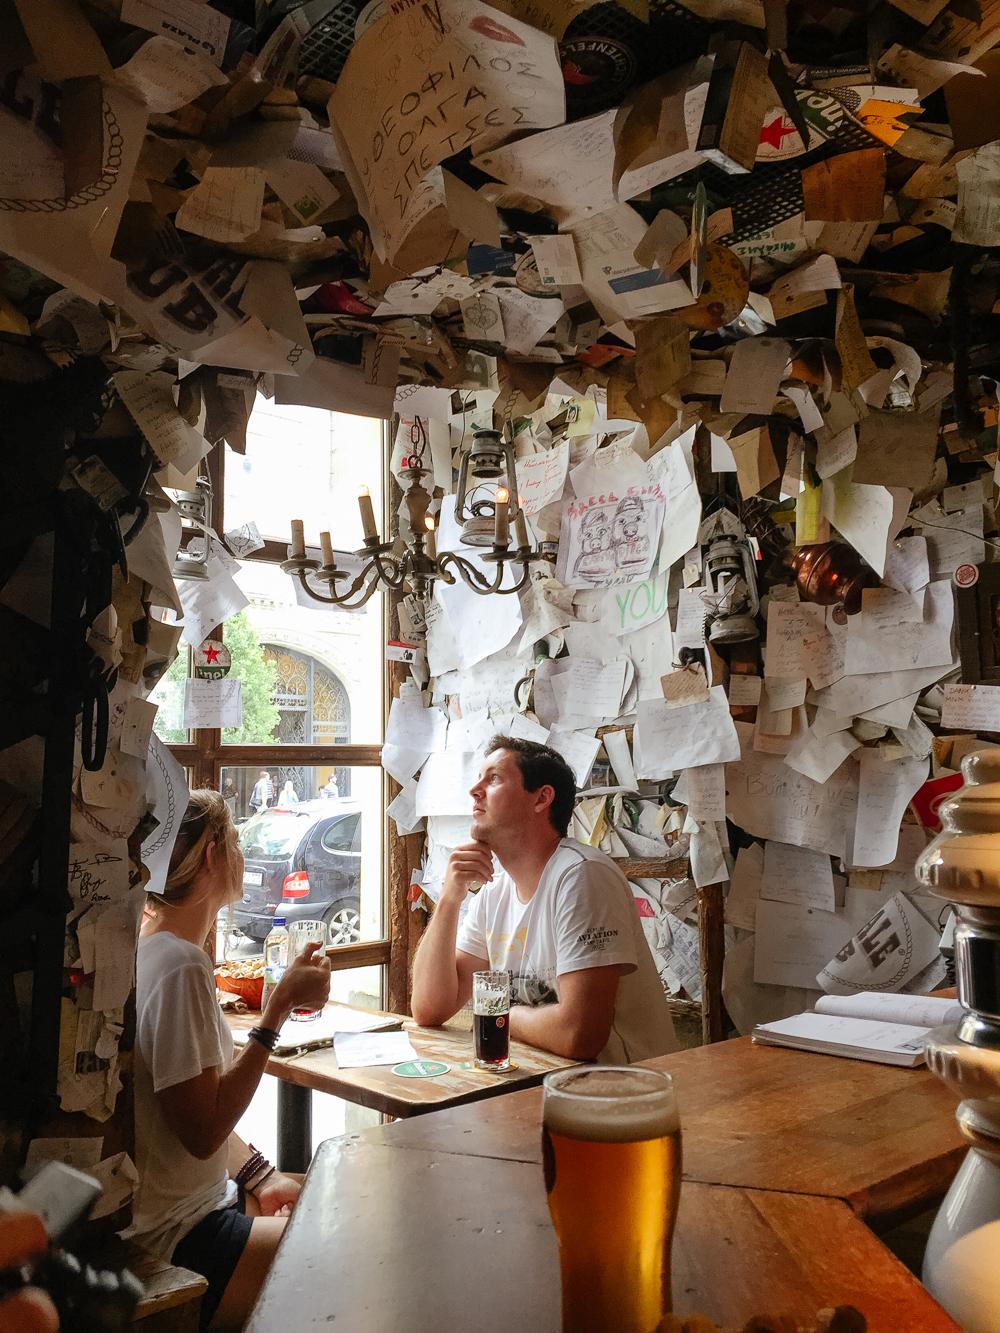 For Sale Pub, Budapest, Hungary